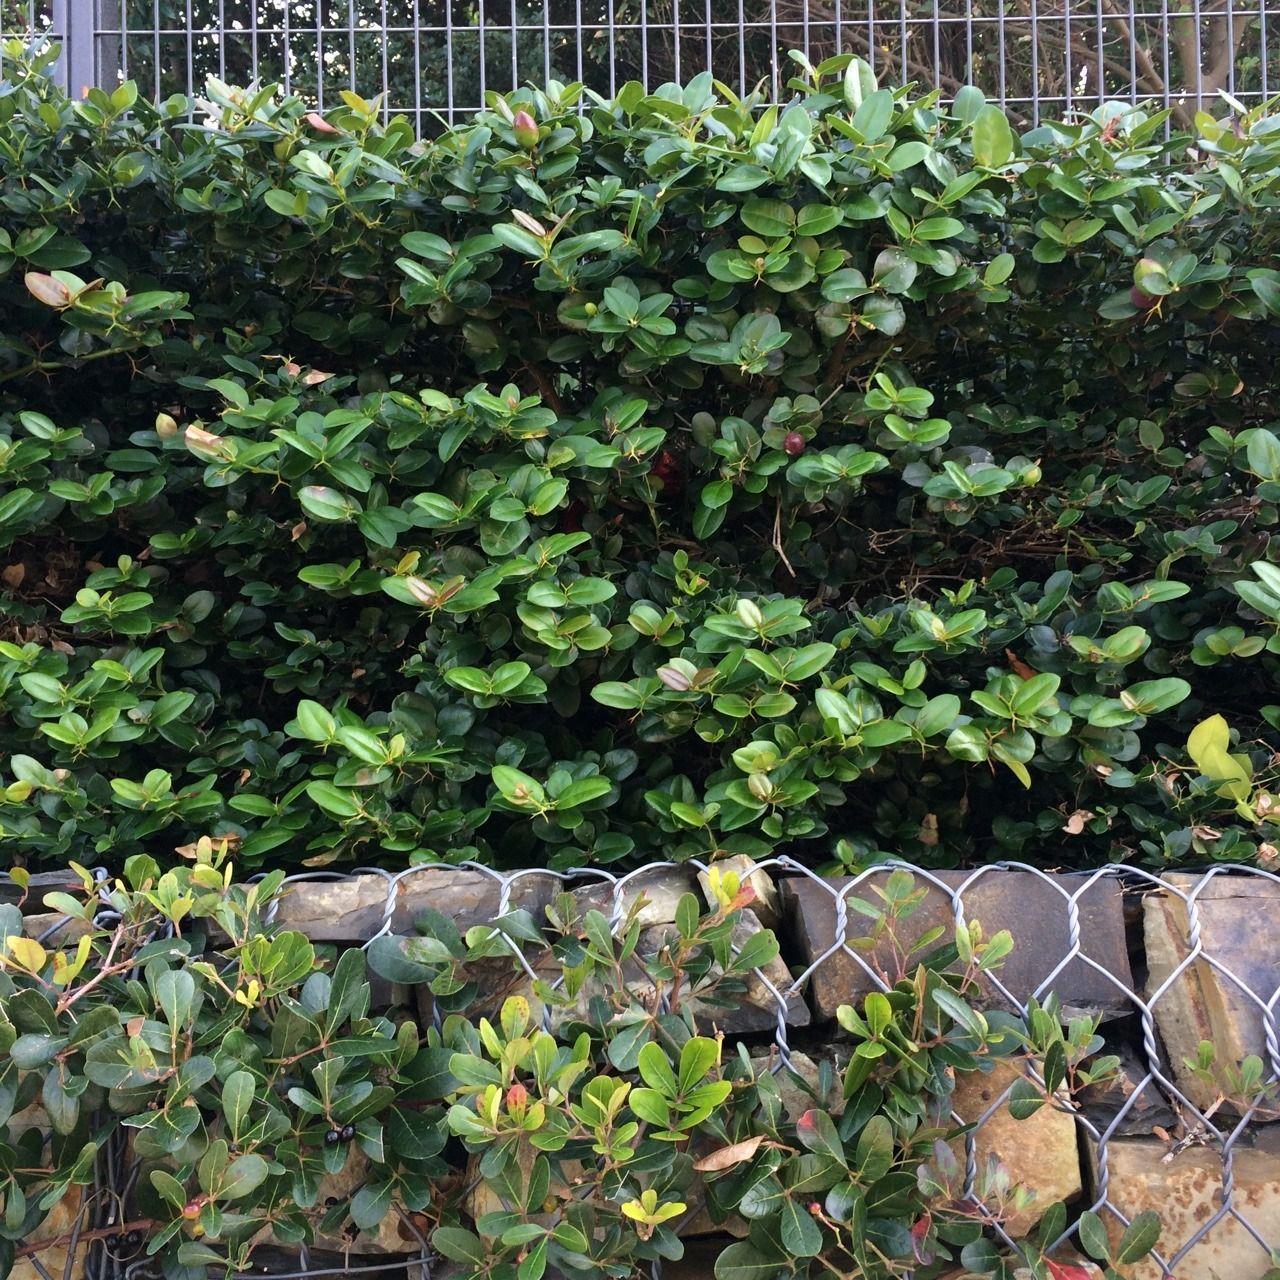 Rhoicissus Digitata As Creeper On Gabion Wall And Carrisa